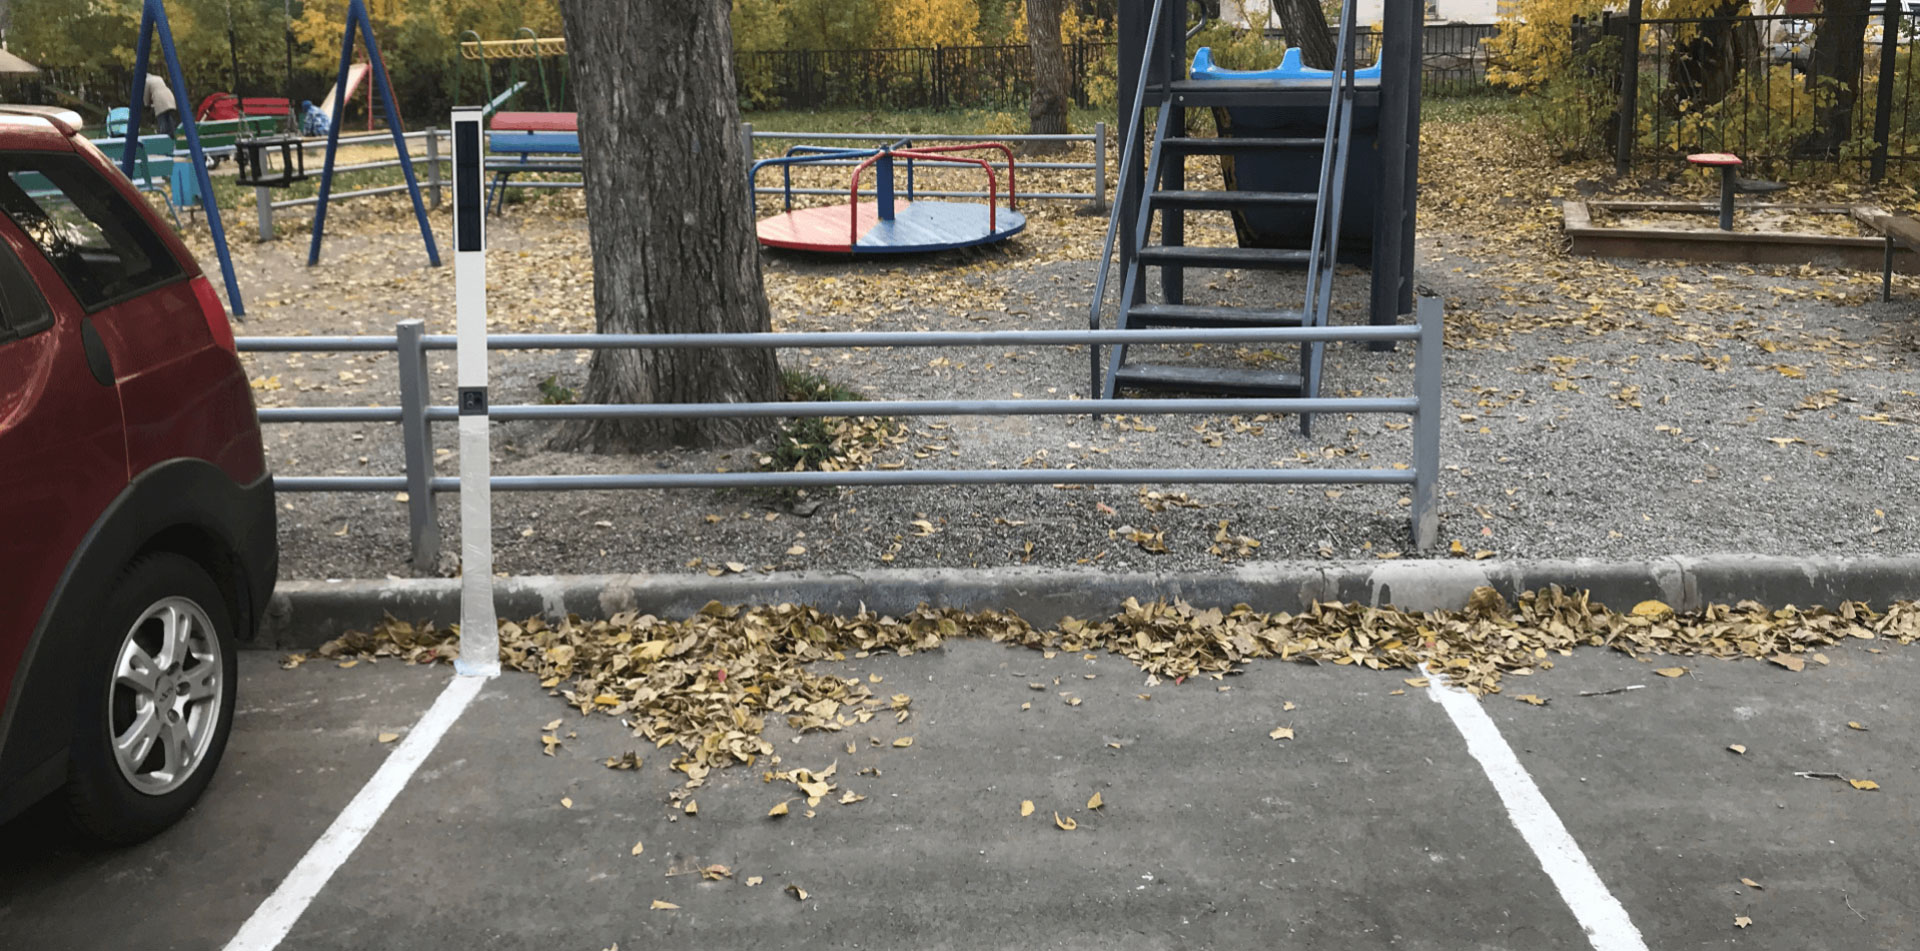 Park<wbr>Post